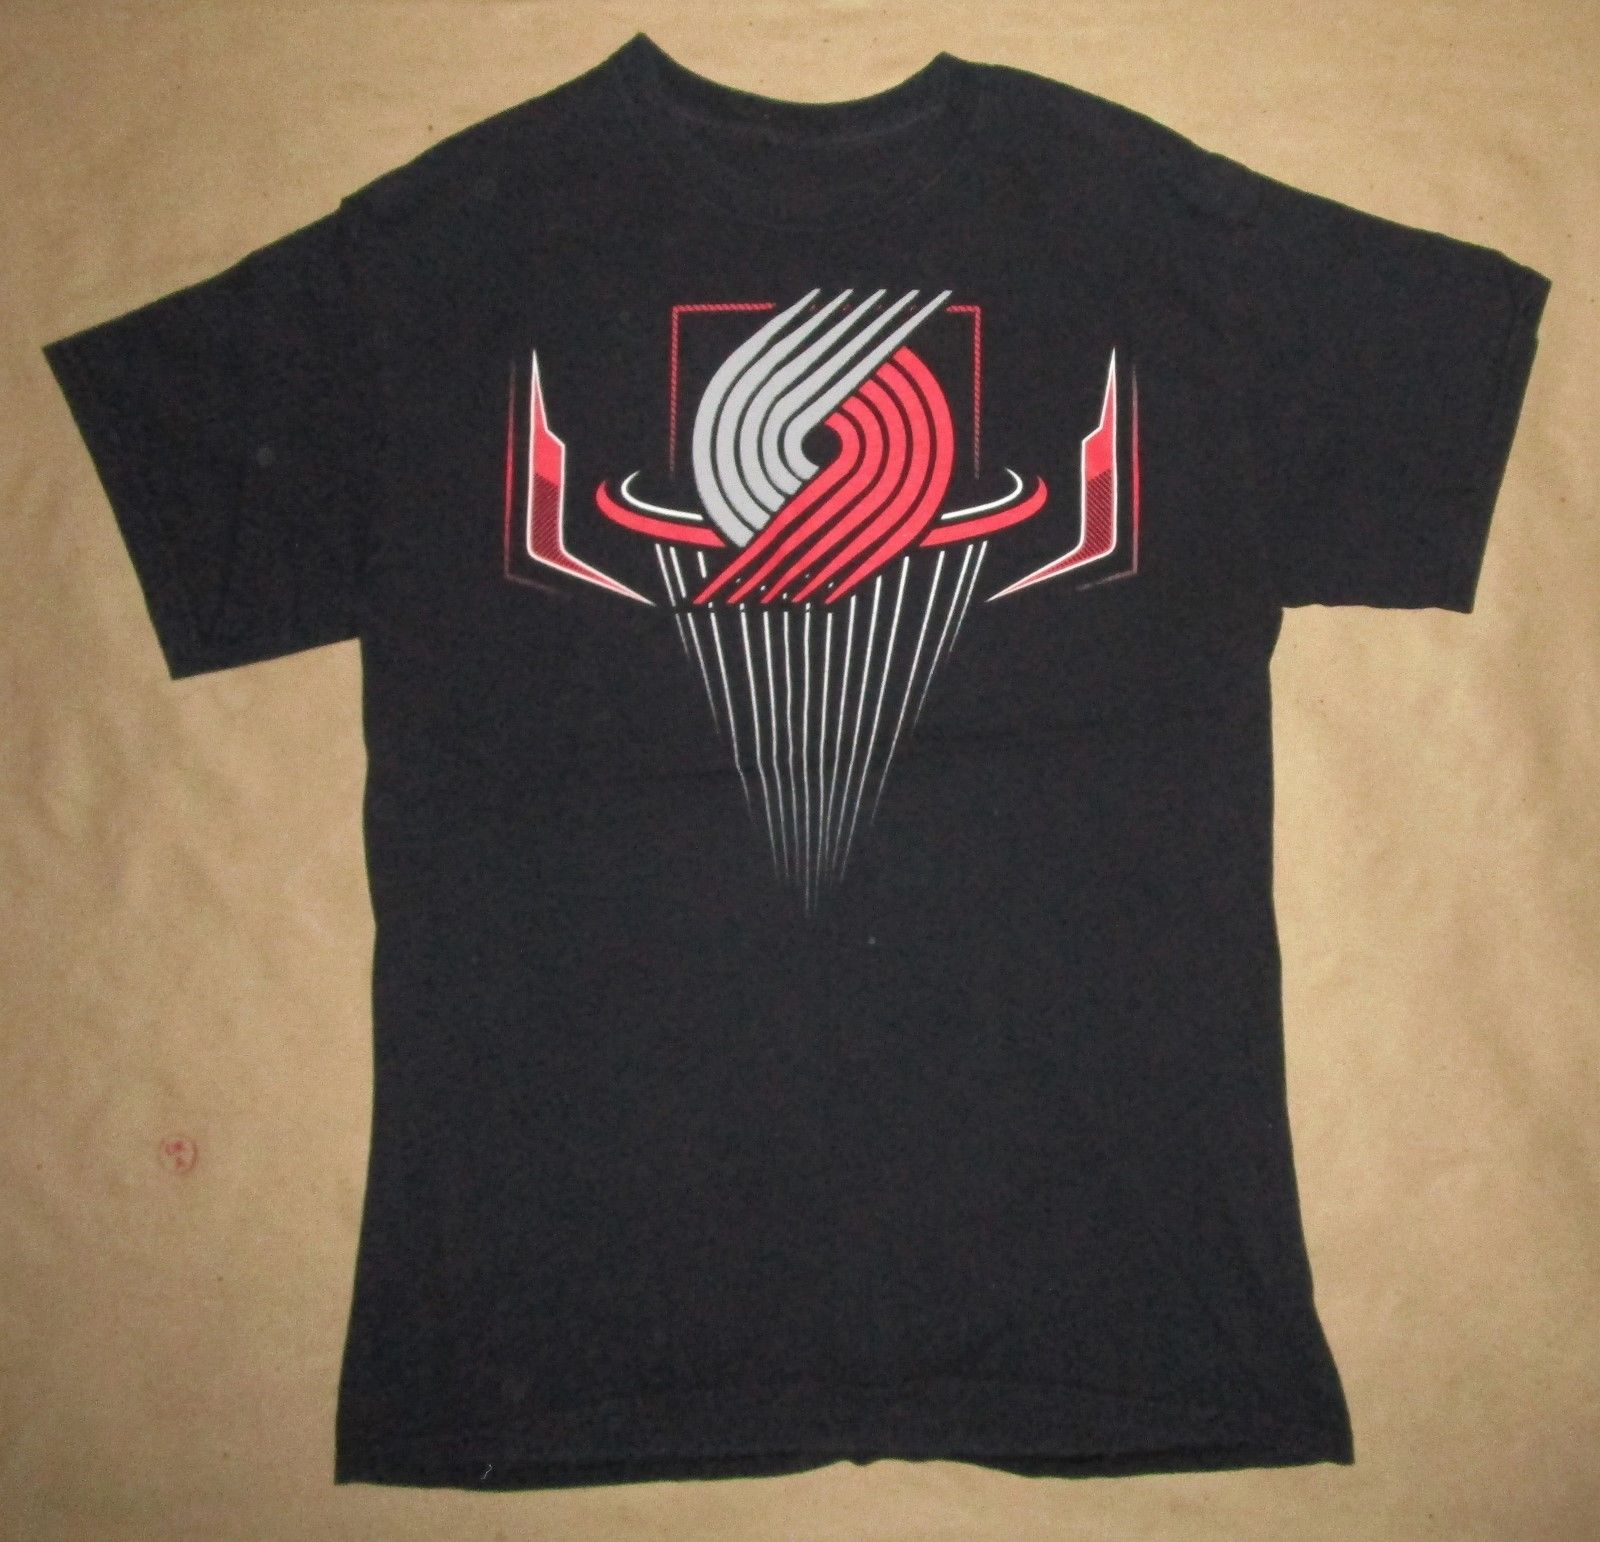 Мед Дэймон lillarder футболка Портленд trailblazerss #0 ...